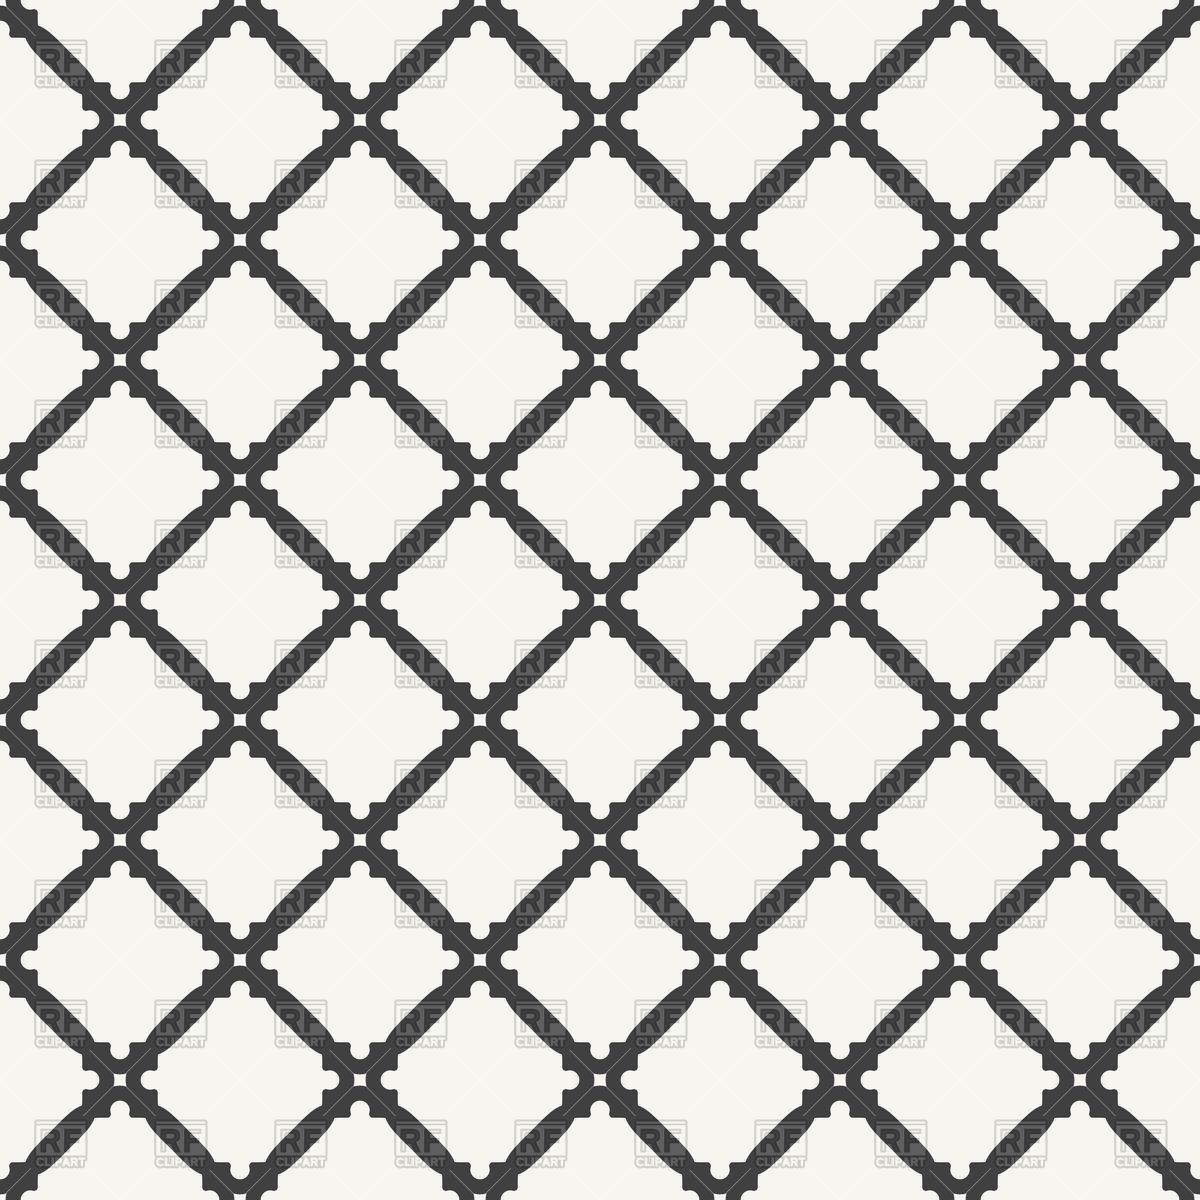 1200x1200 Seamless Pattern With Dark Rhombus Vector Image Vector Artwork